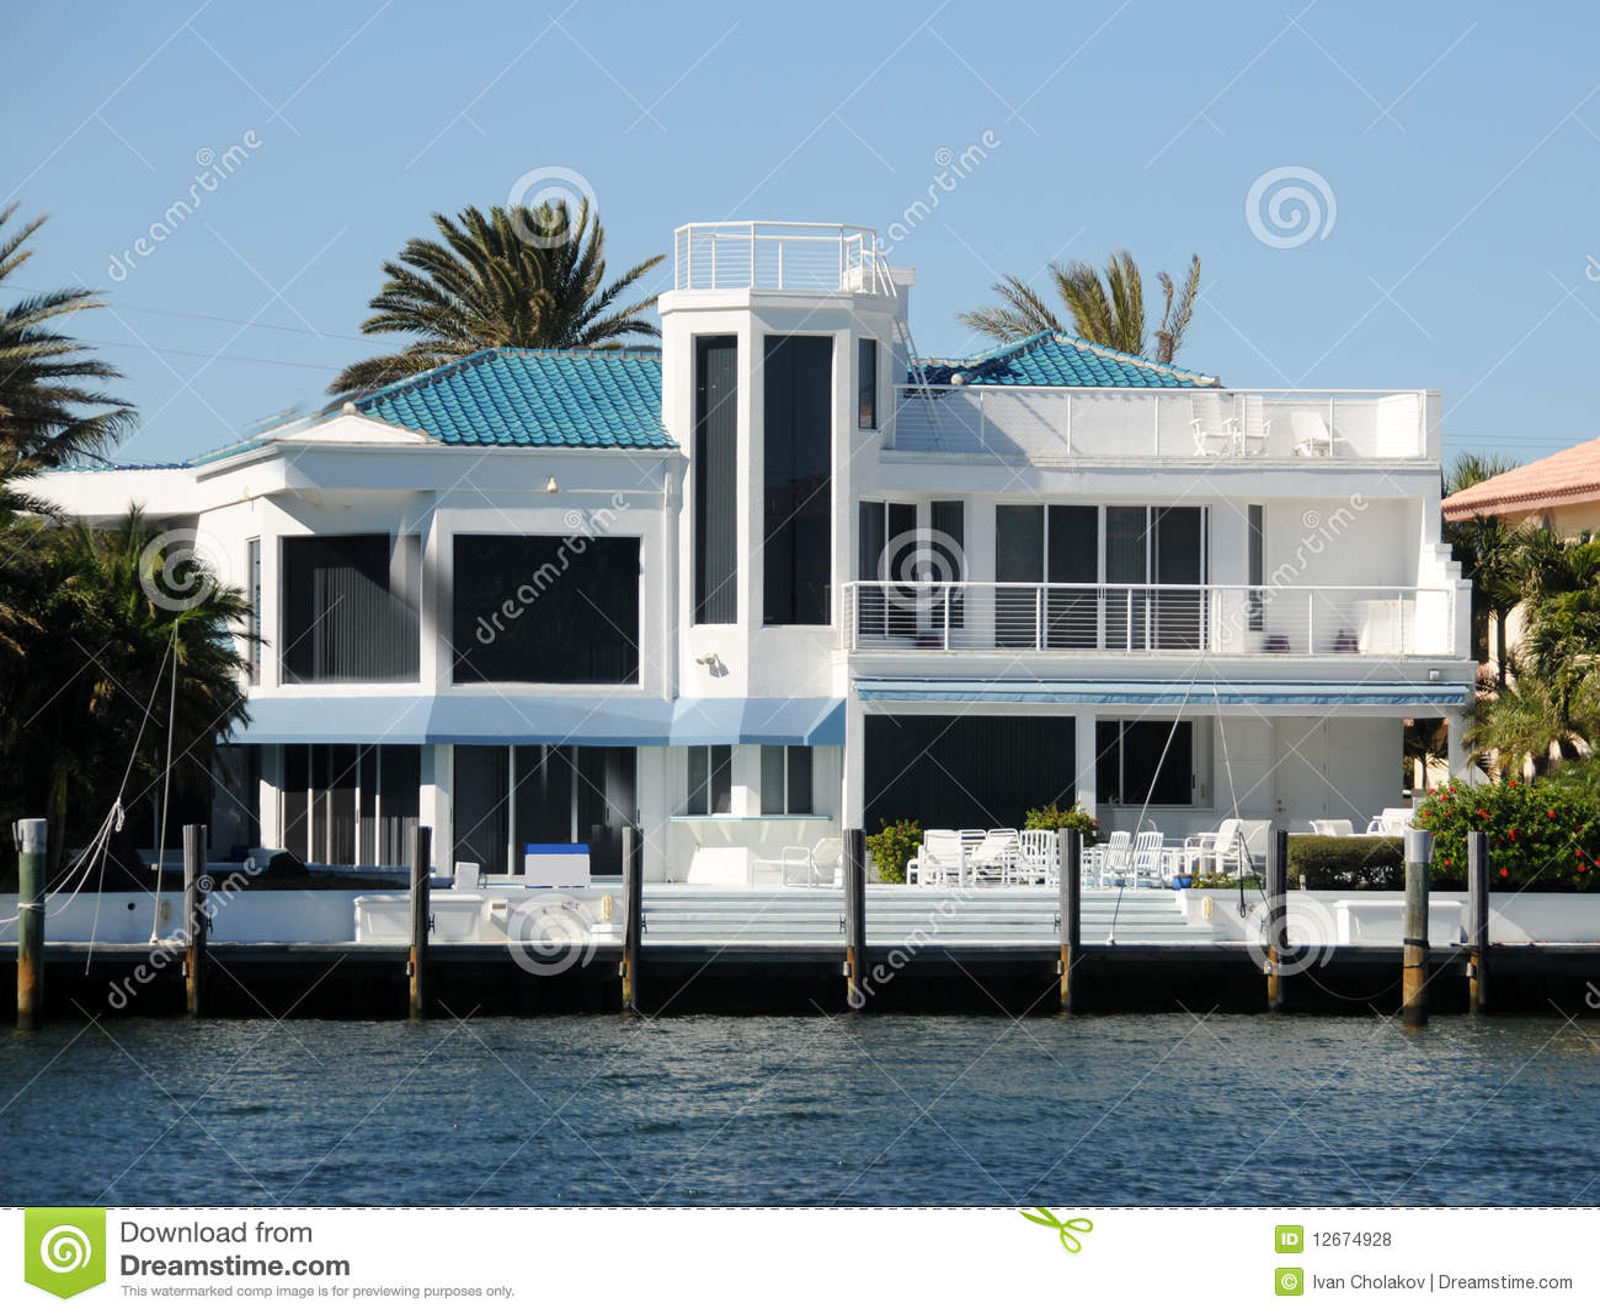 Maison moderne photos libres de droits image 12674928 - Maison moderne bord de mer ...